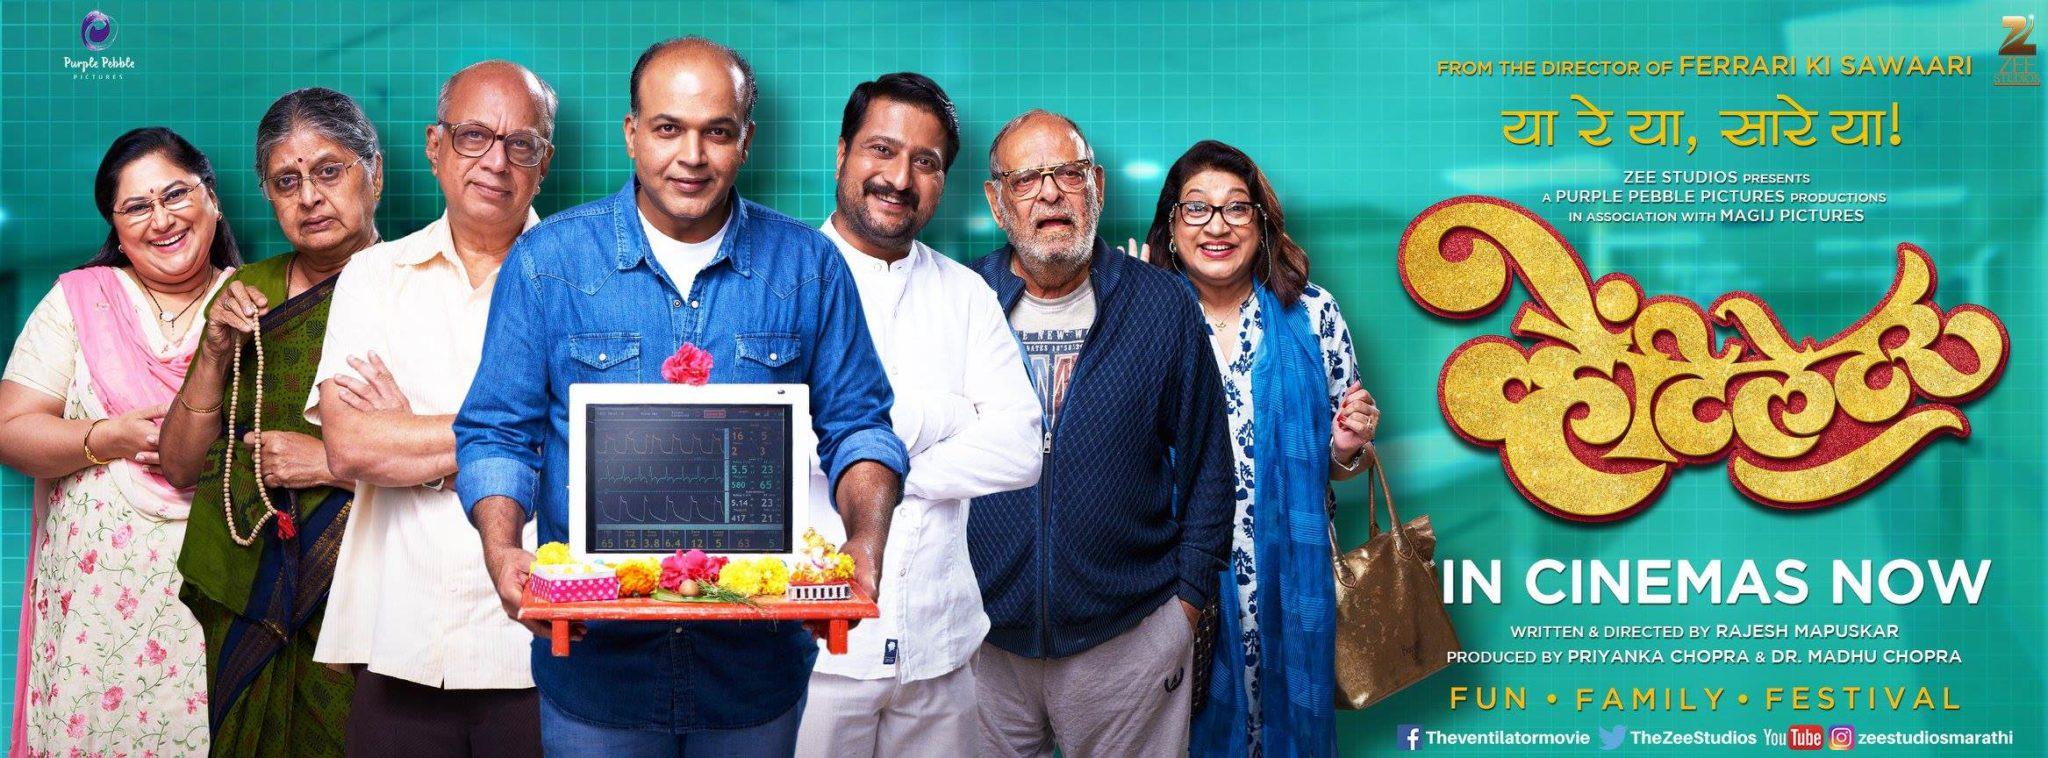 Ventilator Marathi Movie Review - Natakcinema com